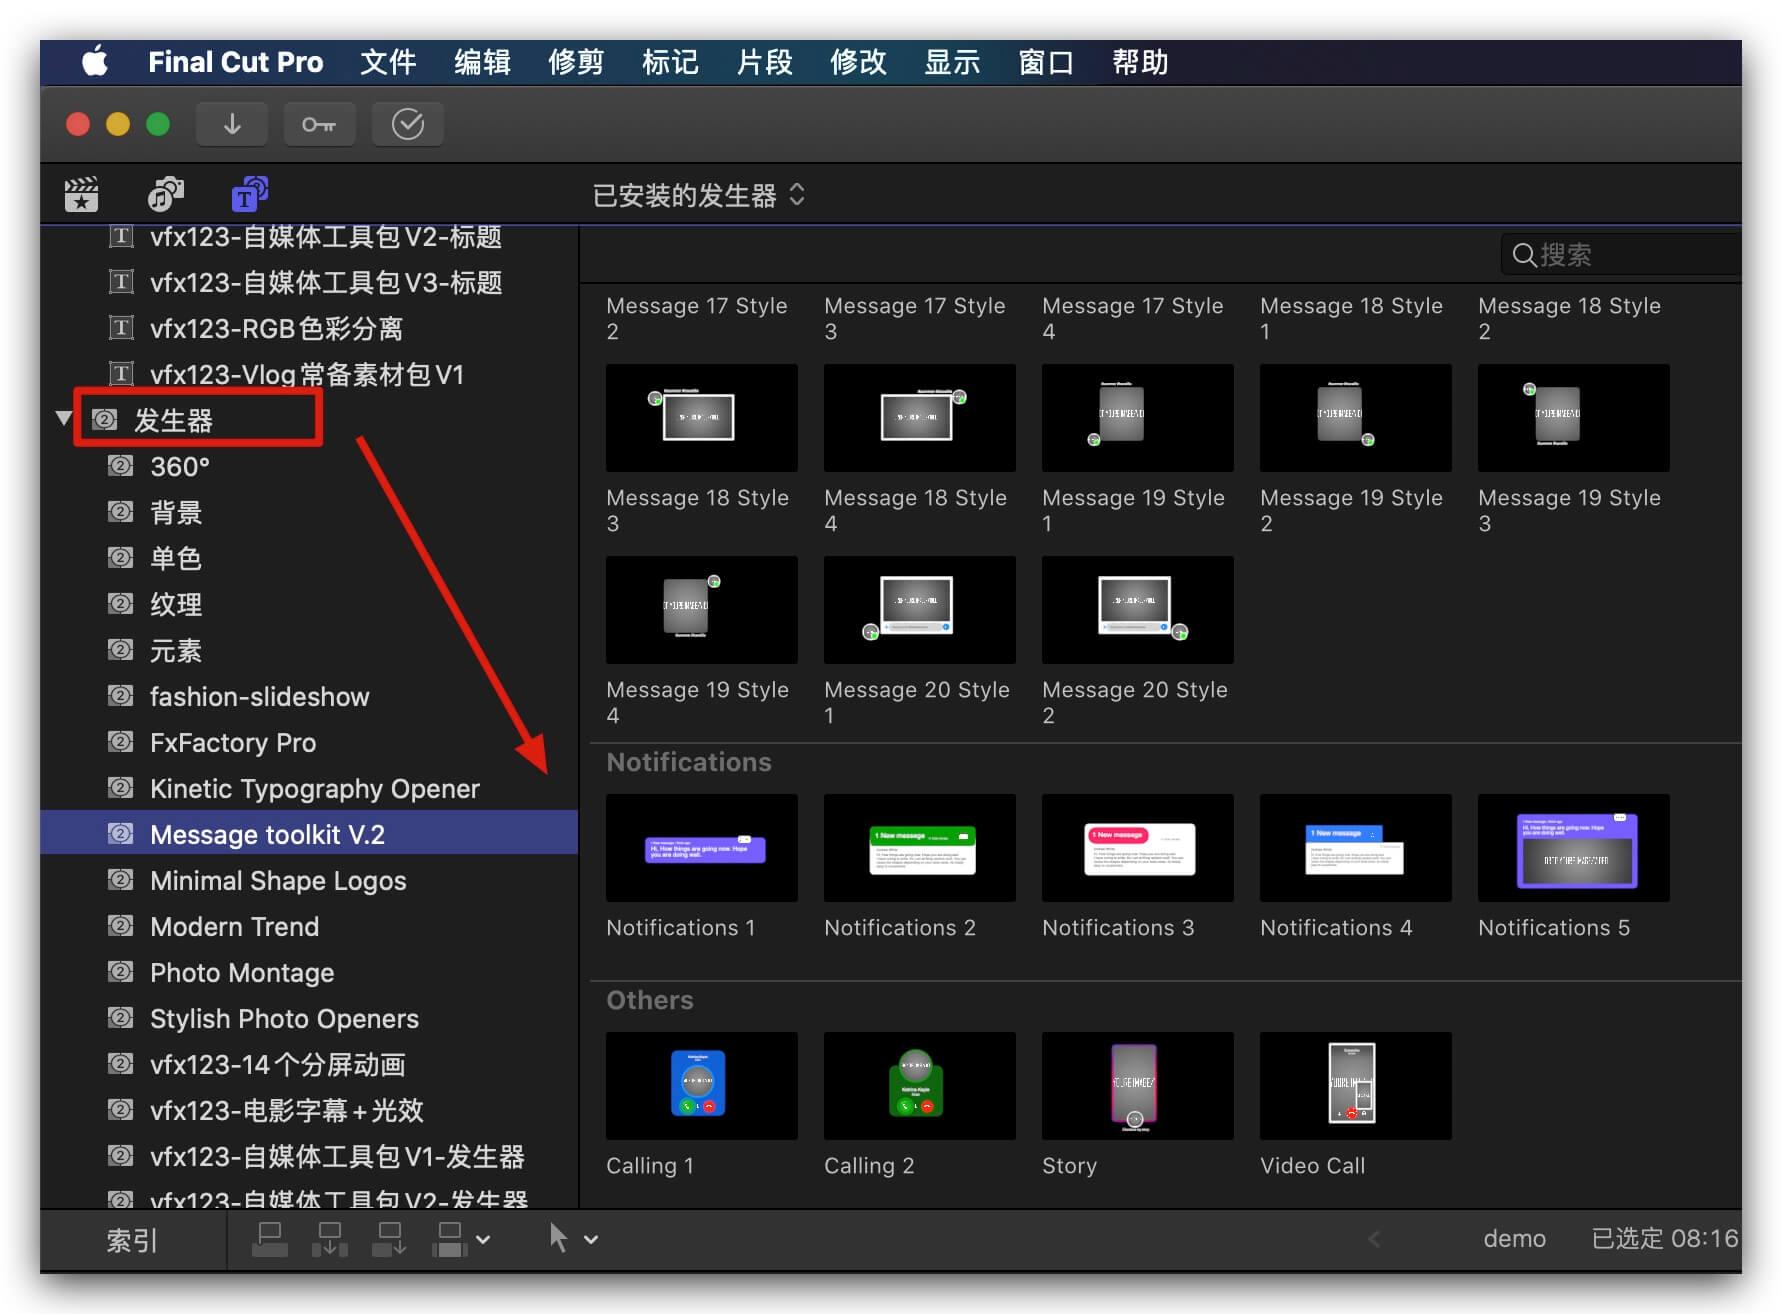 fcpx插件 社交软件聊天消息气泡对话框+表情符号 Message Toolkit V.2